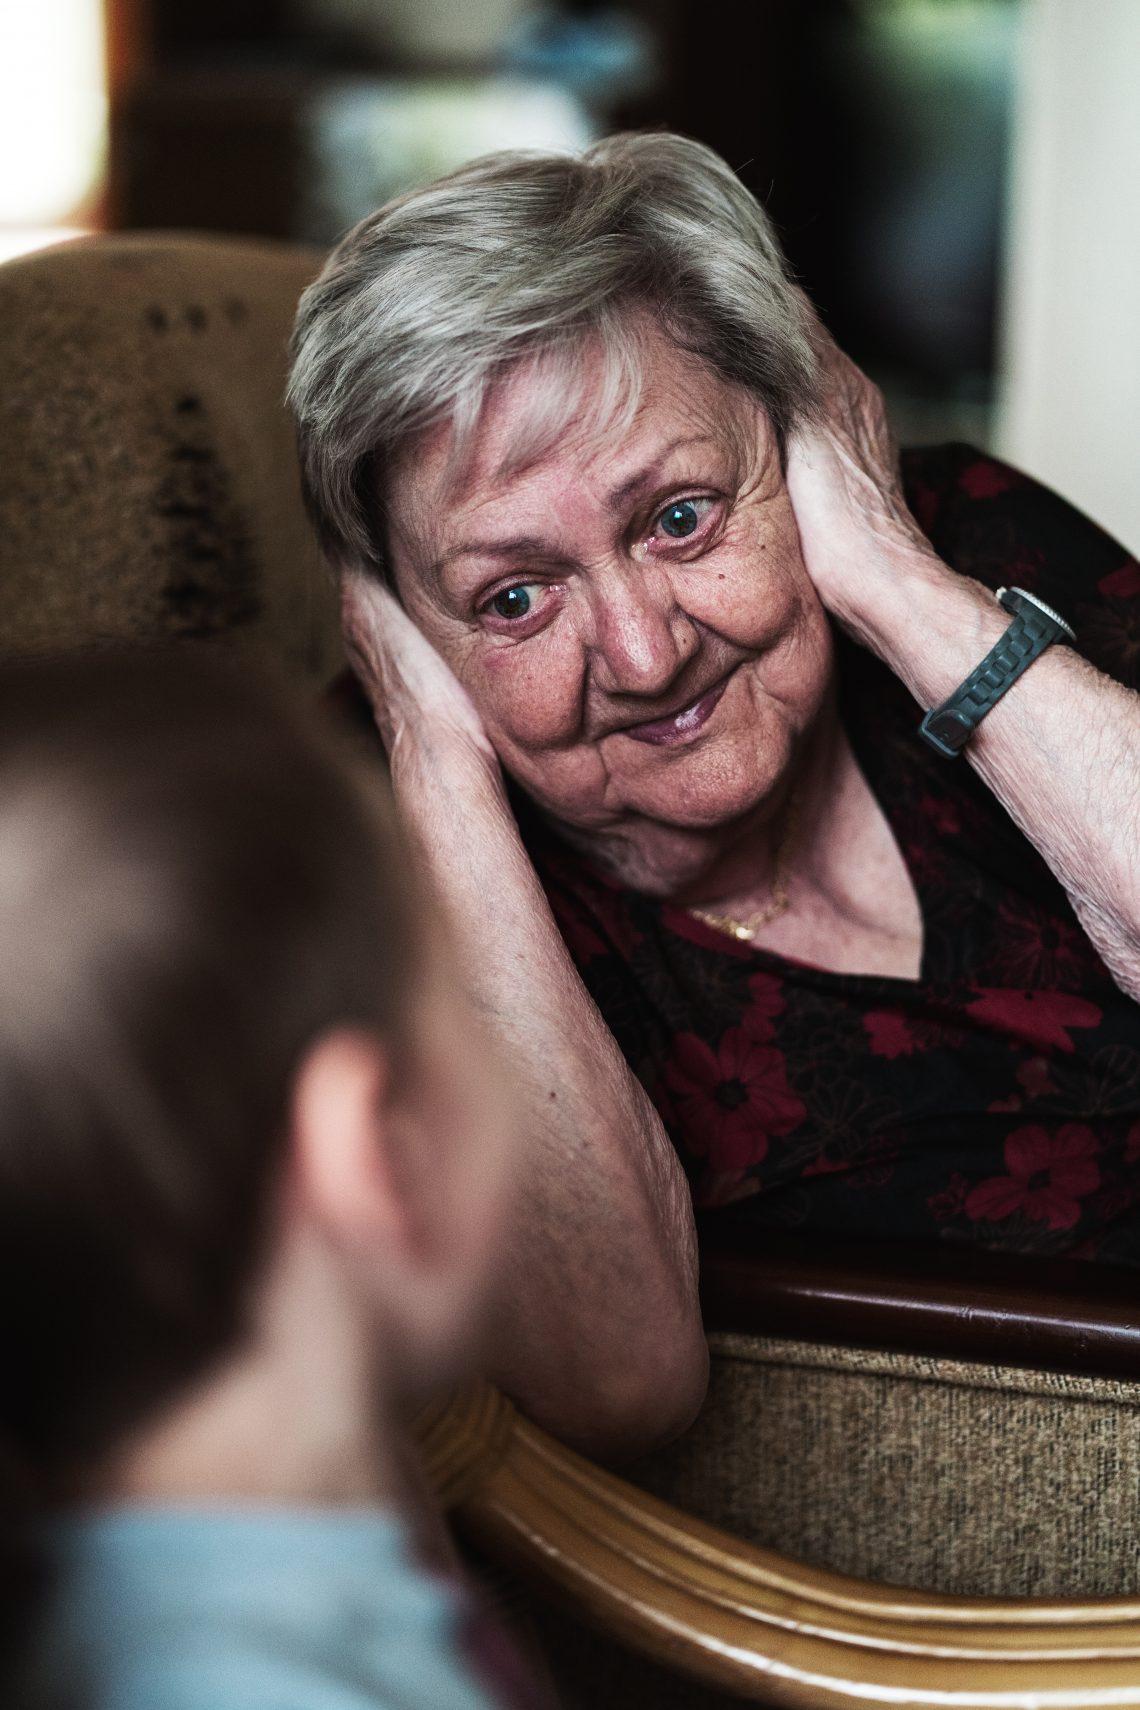 deficit cognitivo persona mayor